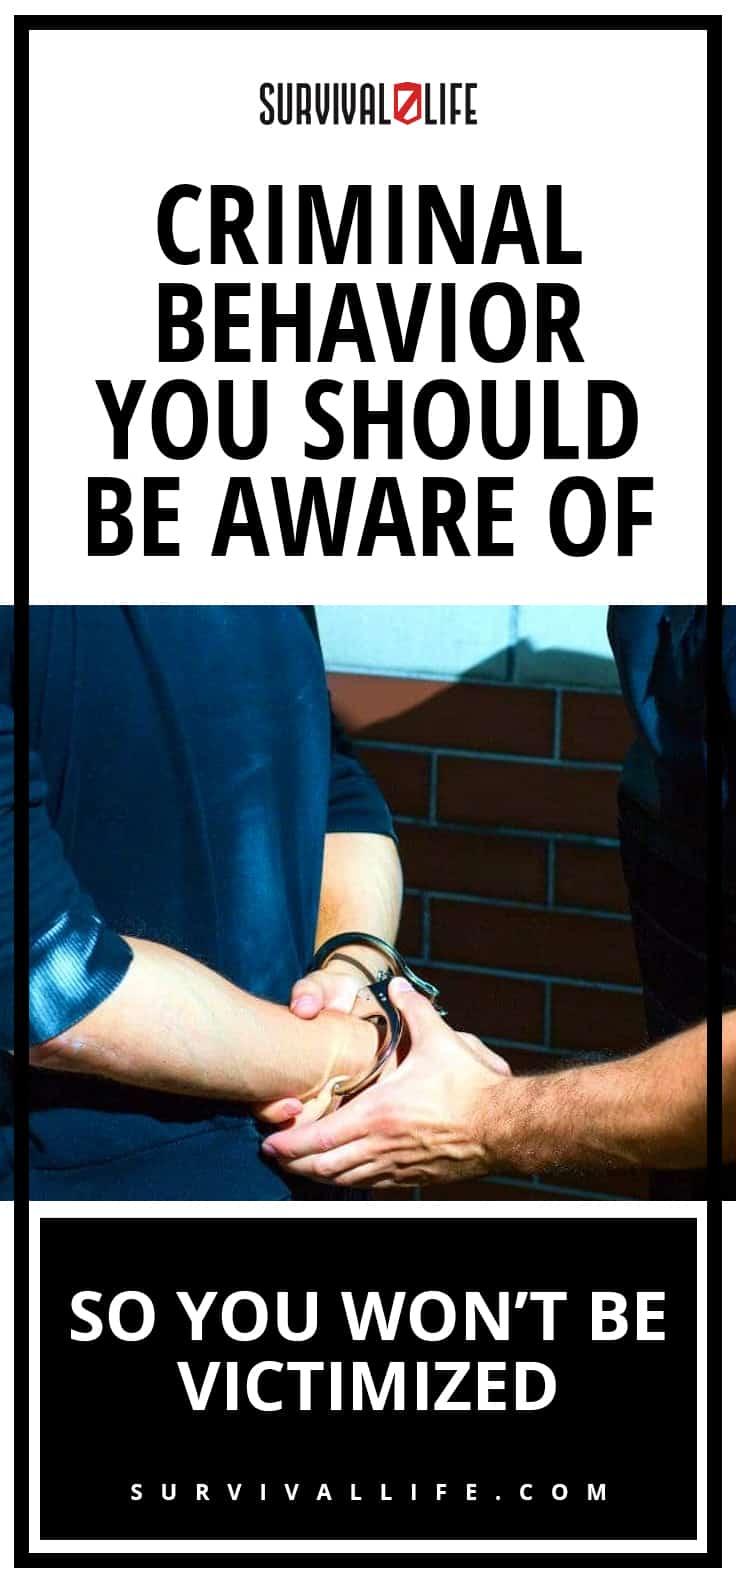 Check out Criminal Behavior You Should Be Aware Of So You Won't Be Victimized at https://survivallife.com/criminal-behavior/